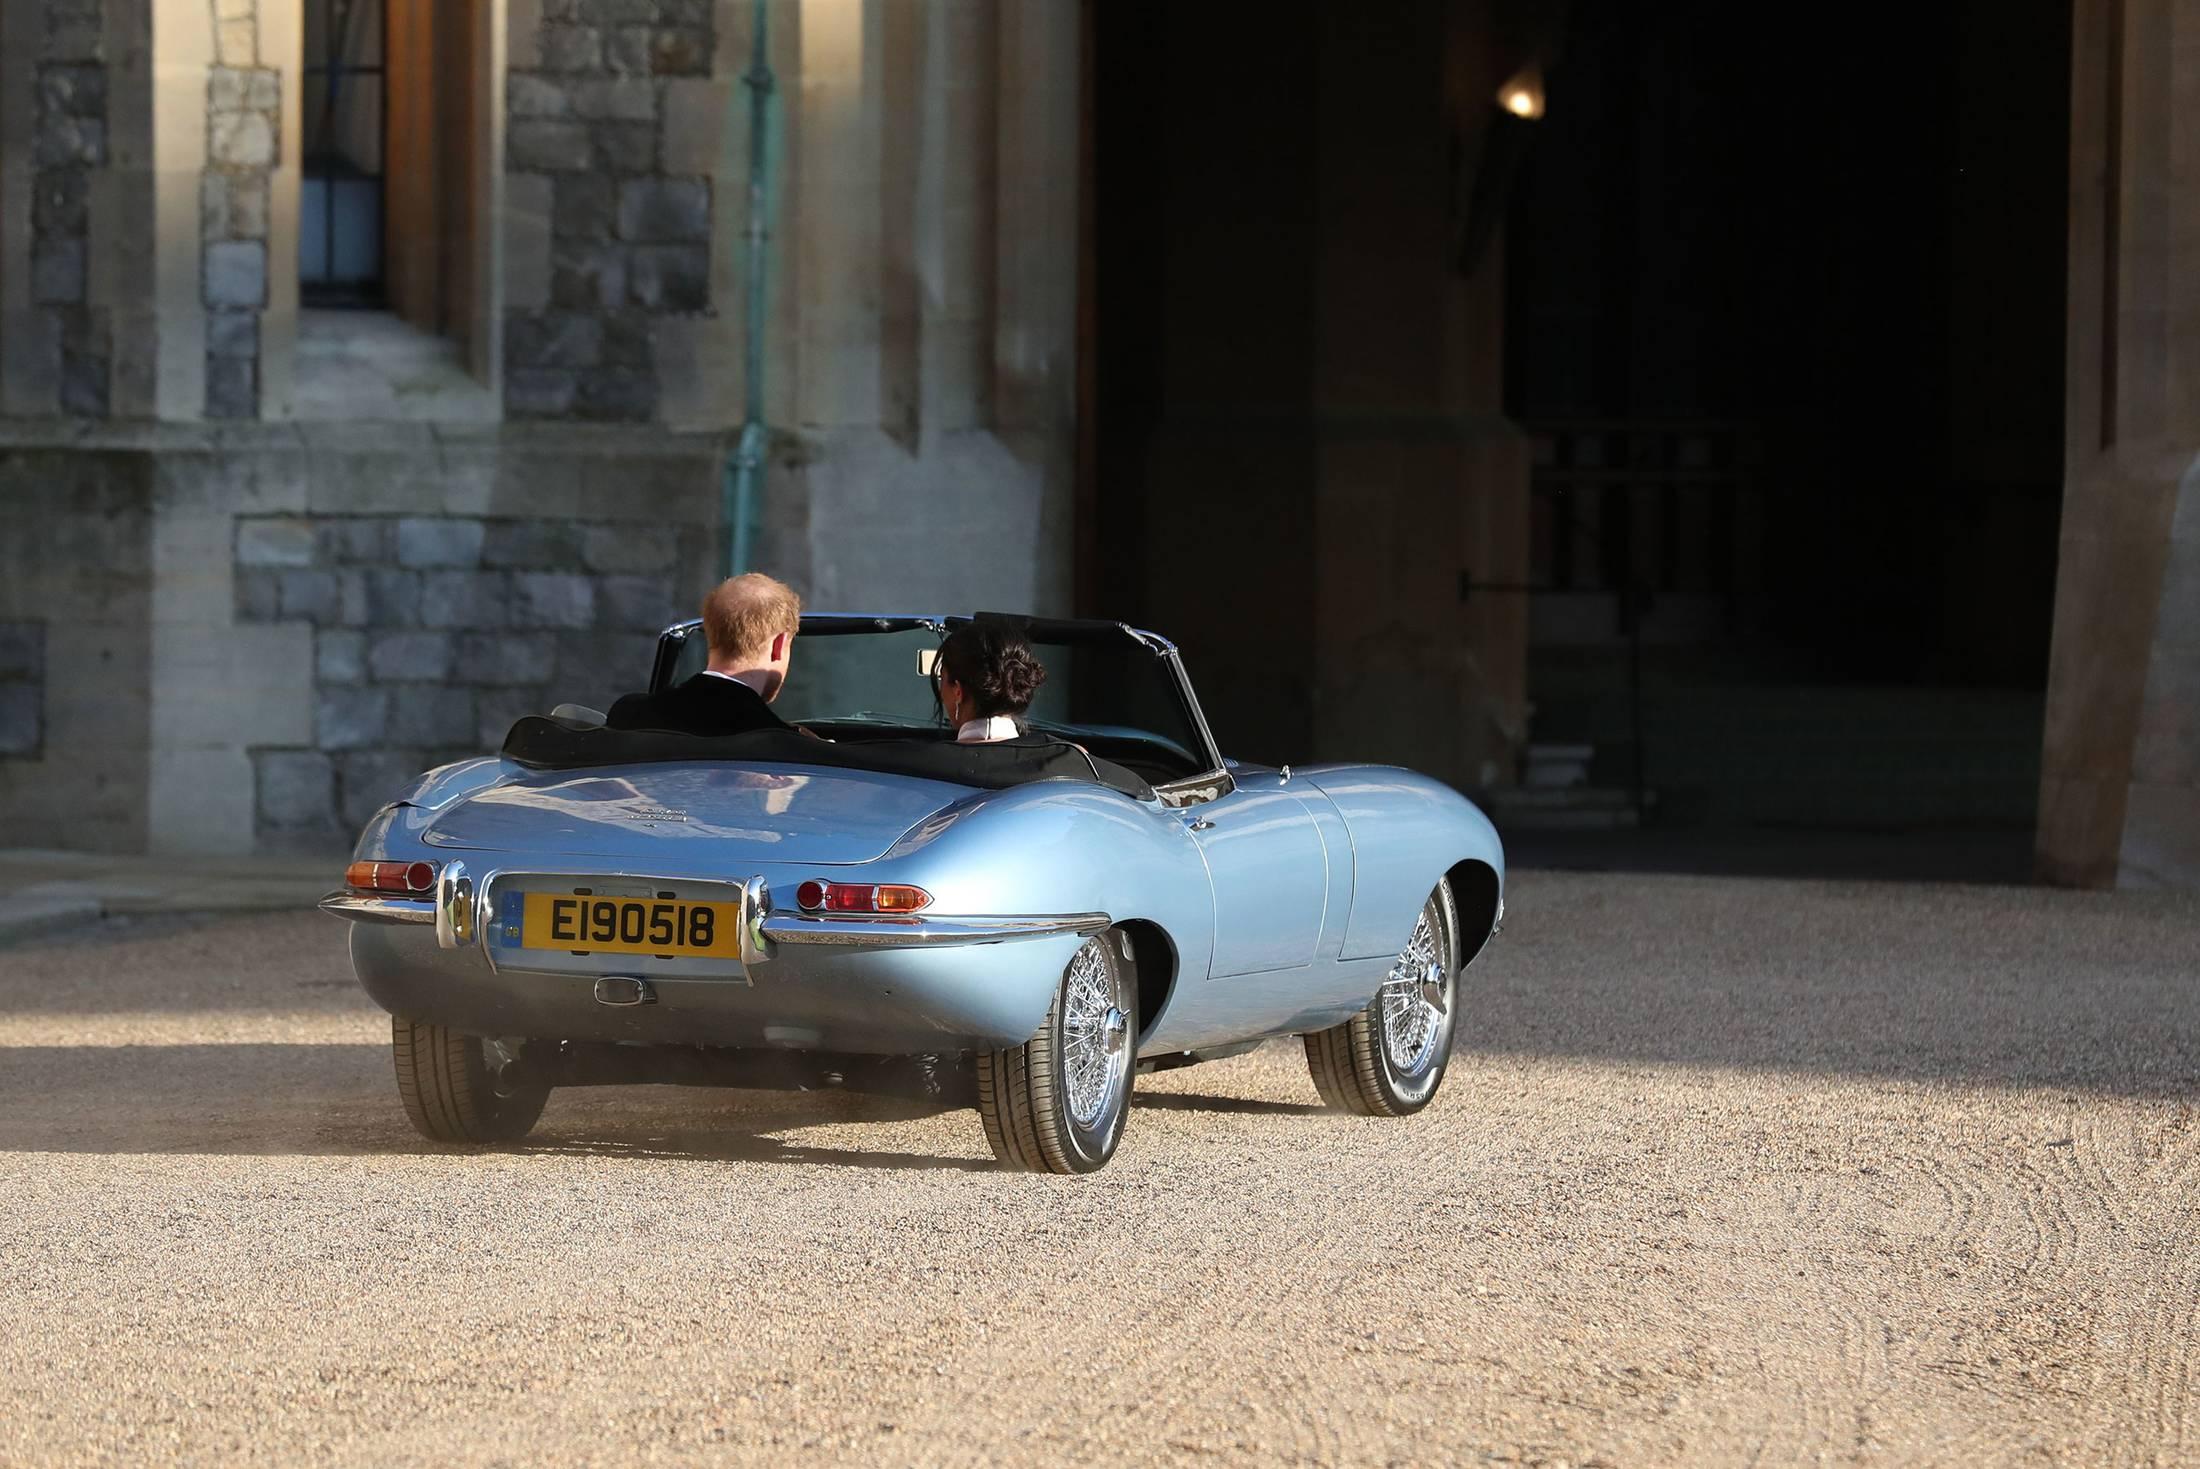 prince harry meghan markle jaguar wedding exit car